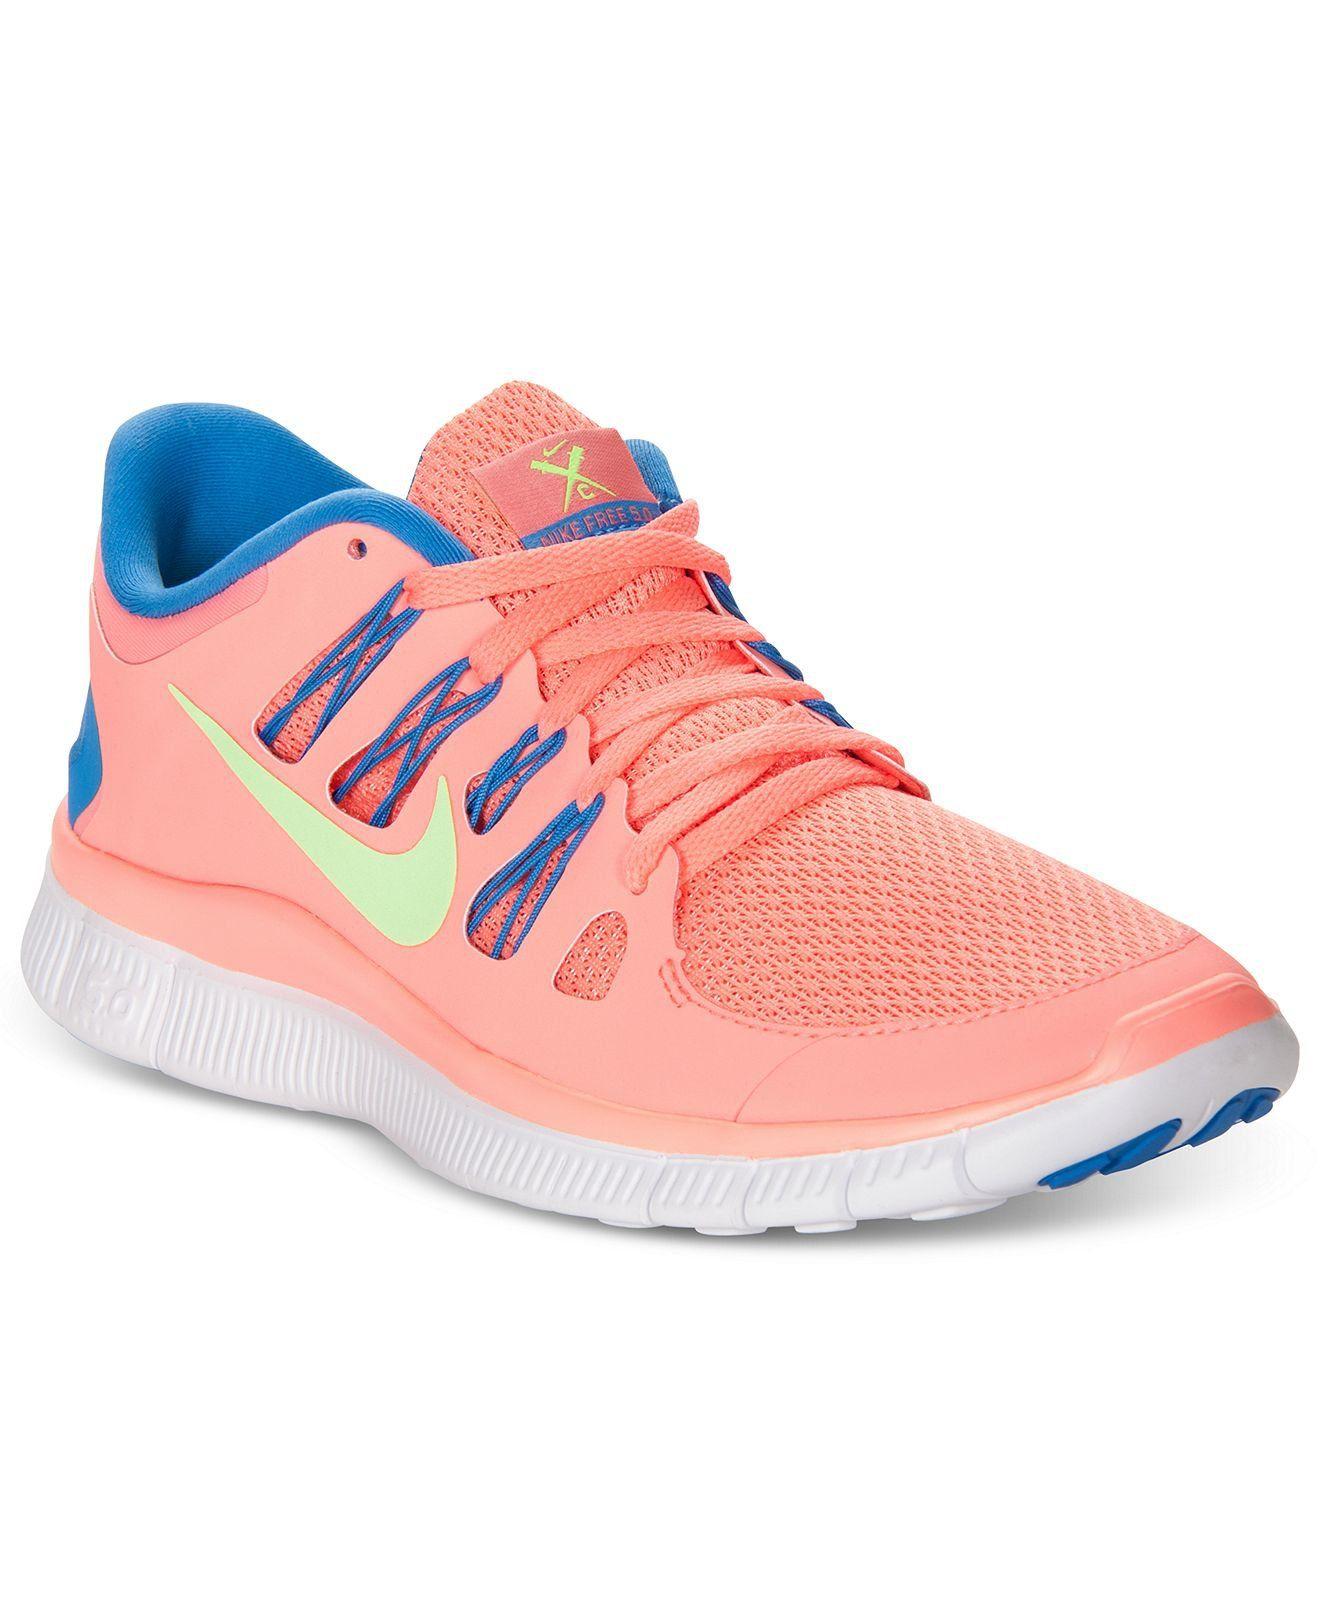 Nike Womens Shoes 40b97d1e3